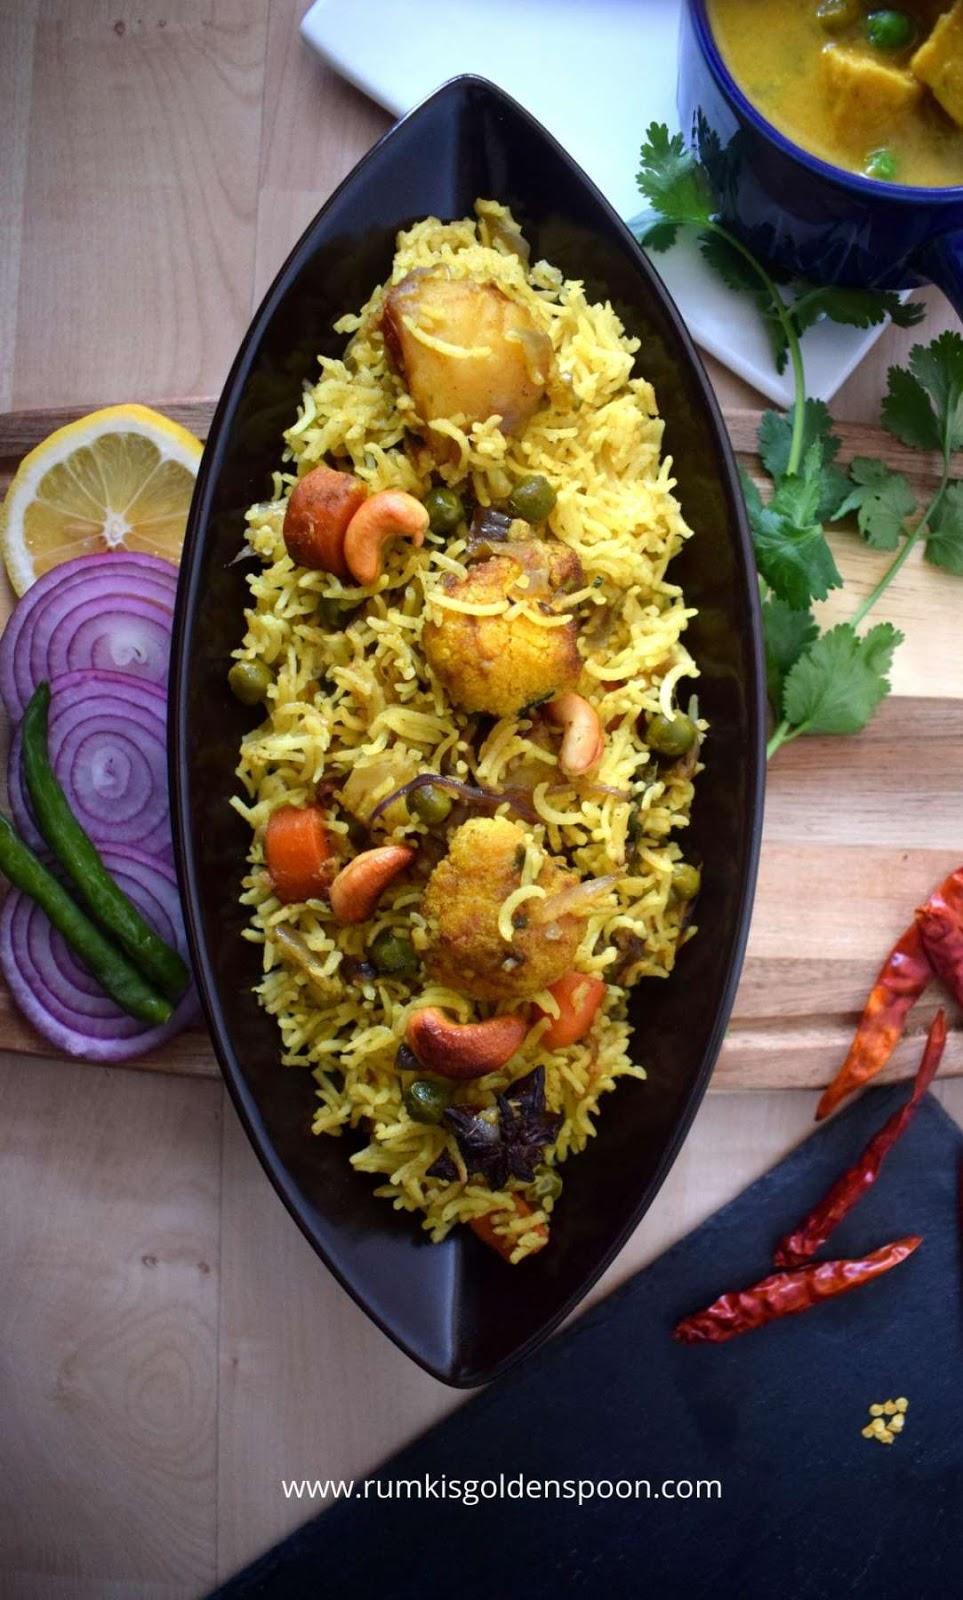 Indian Recipe, Vegetarian Recipe, Easy Vegetable Dum Biryani, Rumki's Golden Spoon, recipe of vegetable biryani, hyderabadi style dum biryani, flavoured rice with vegetables, vegan/vegetable rice recipe